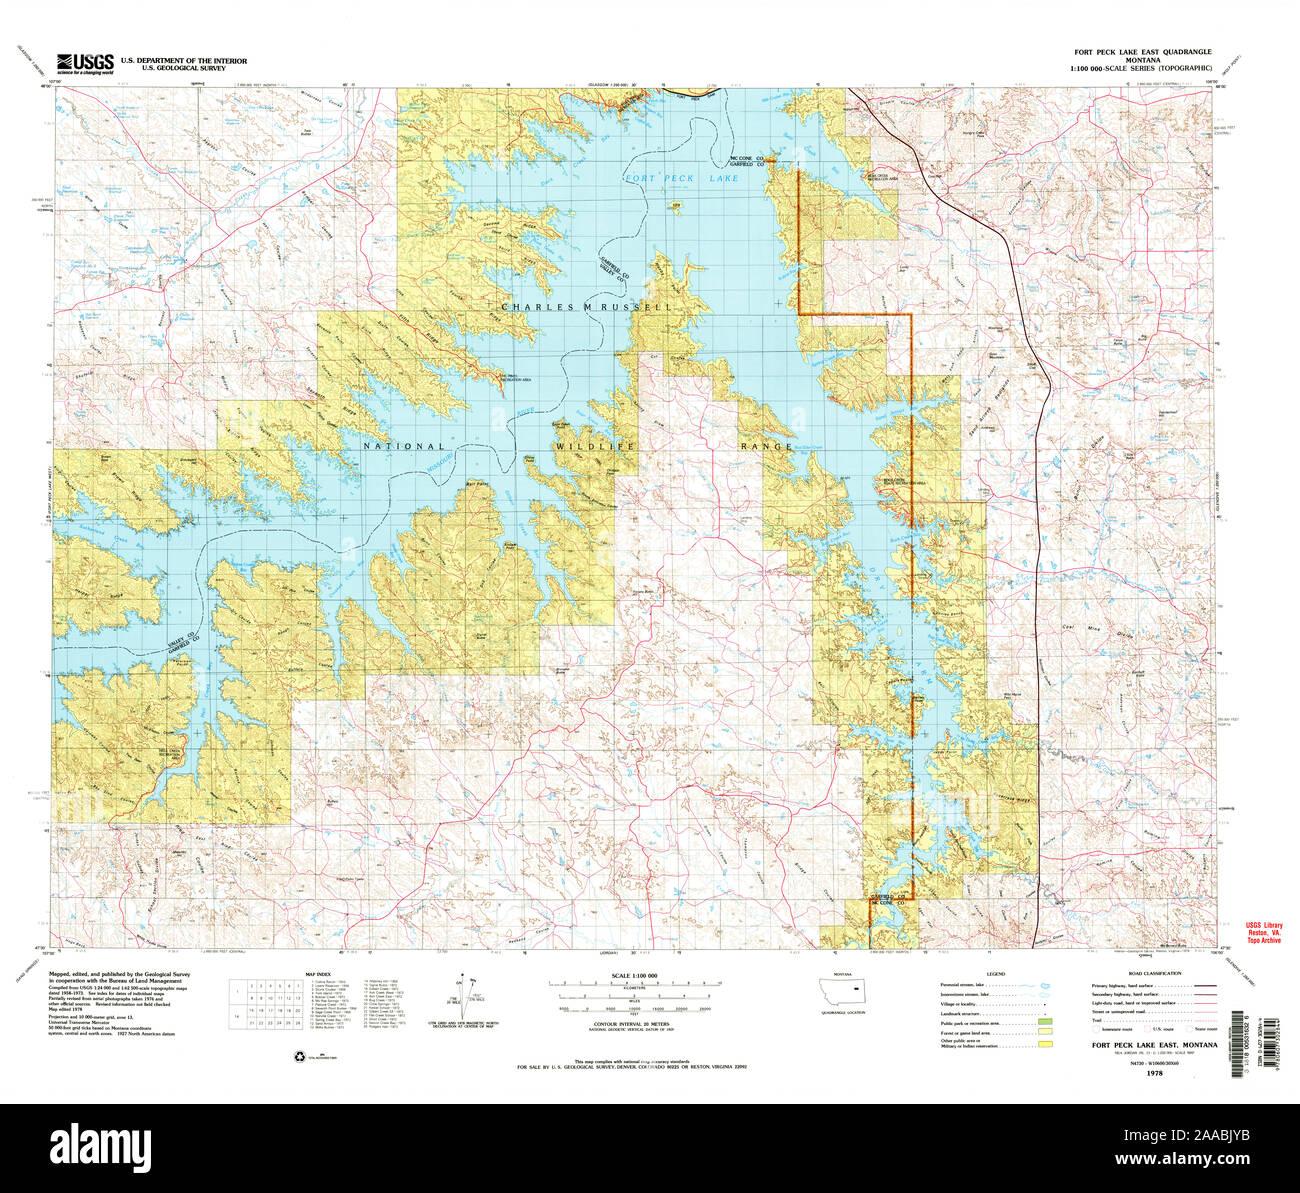 fort peck lake map Usgs Topo Map Montana Mt Fort Peck Lake East 268408 1978 100000 fort peck lake map